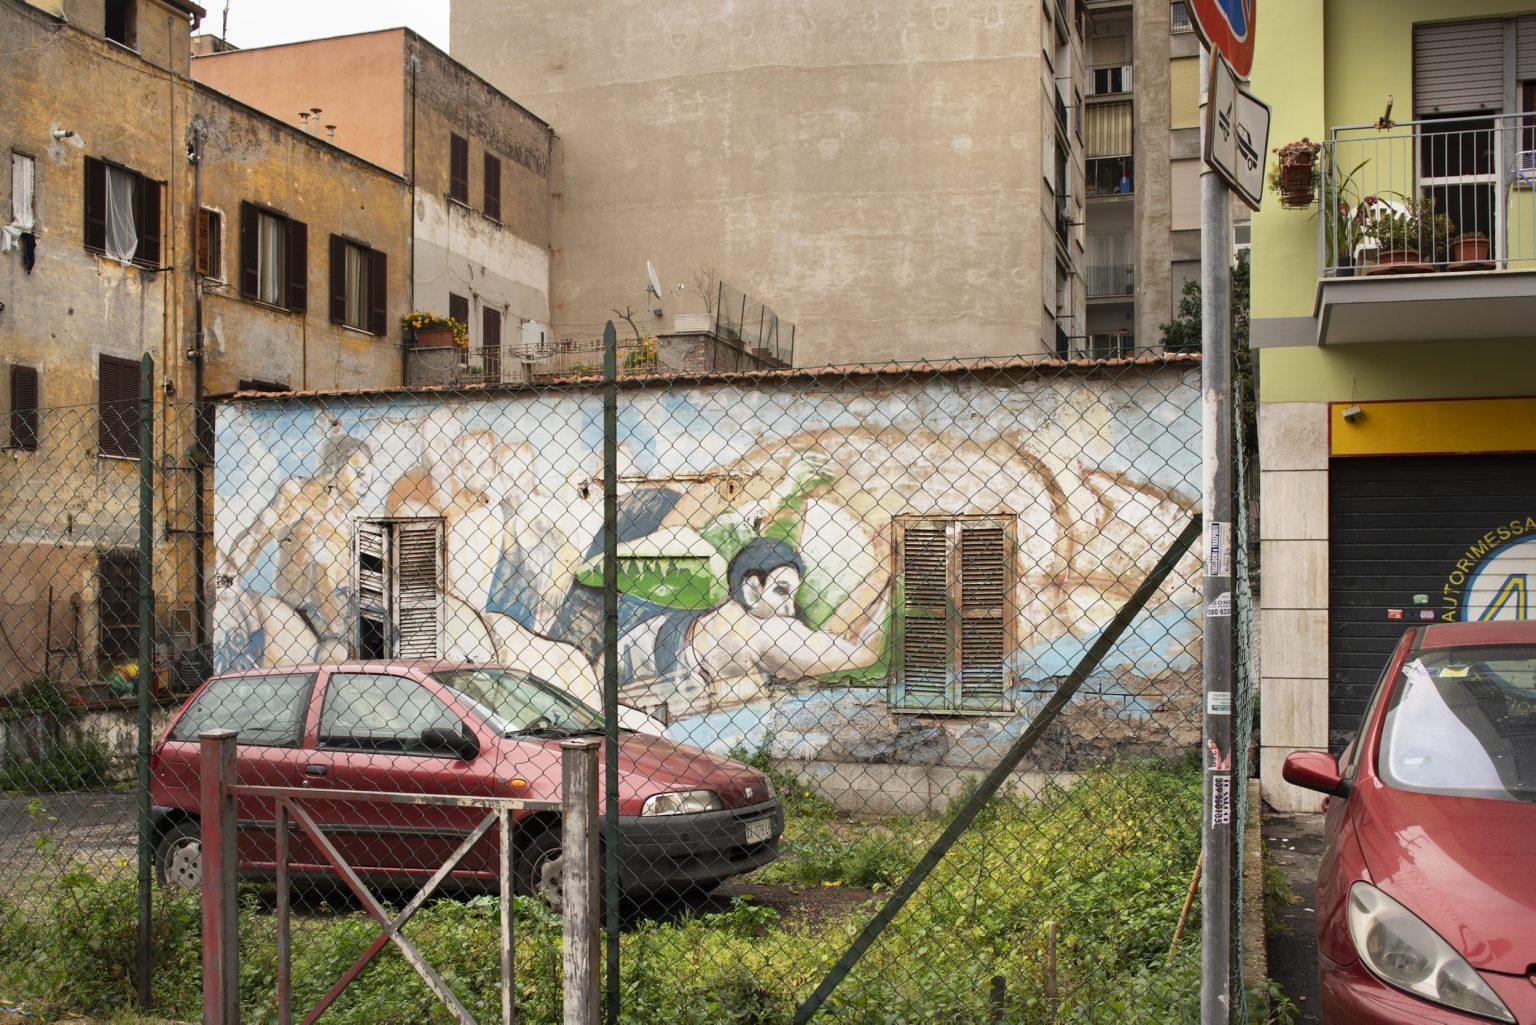 Rome, April 2017 - Via Carlo della Rocca. Torpignattara district. >< Roma, aprile 2017 - Via Carlo della Rocca. Quartiere Torpignattara.